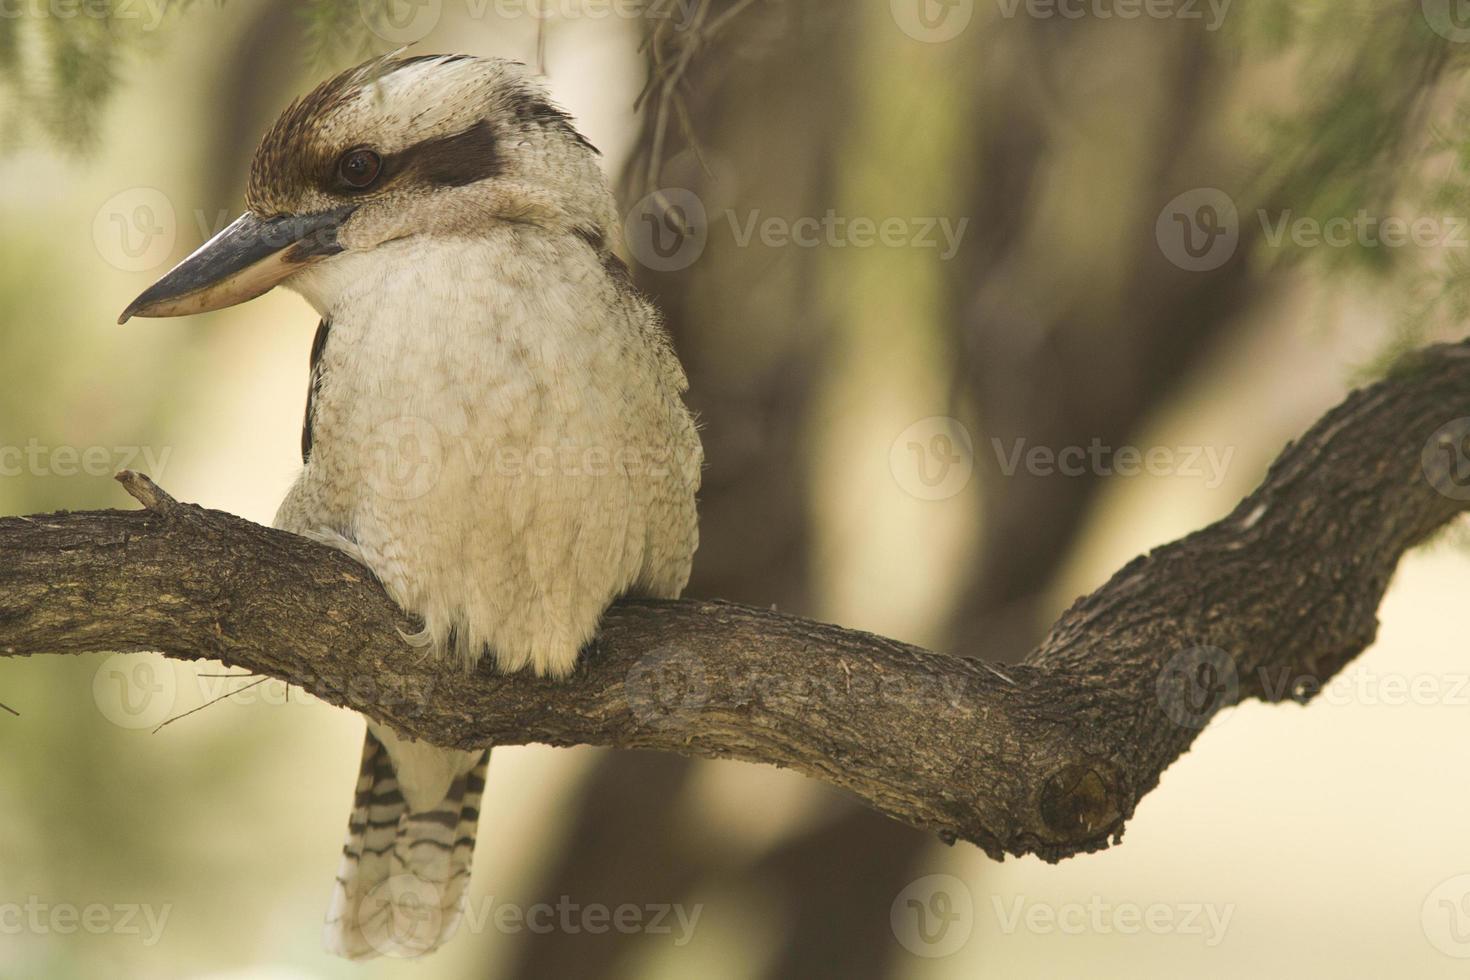 kookaburra australien. photo